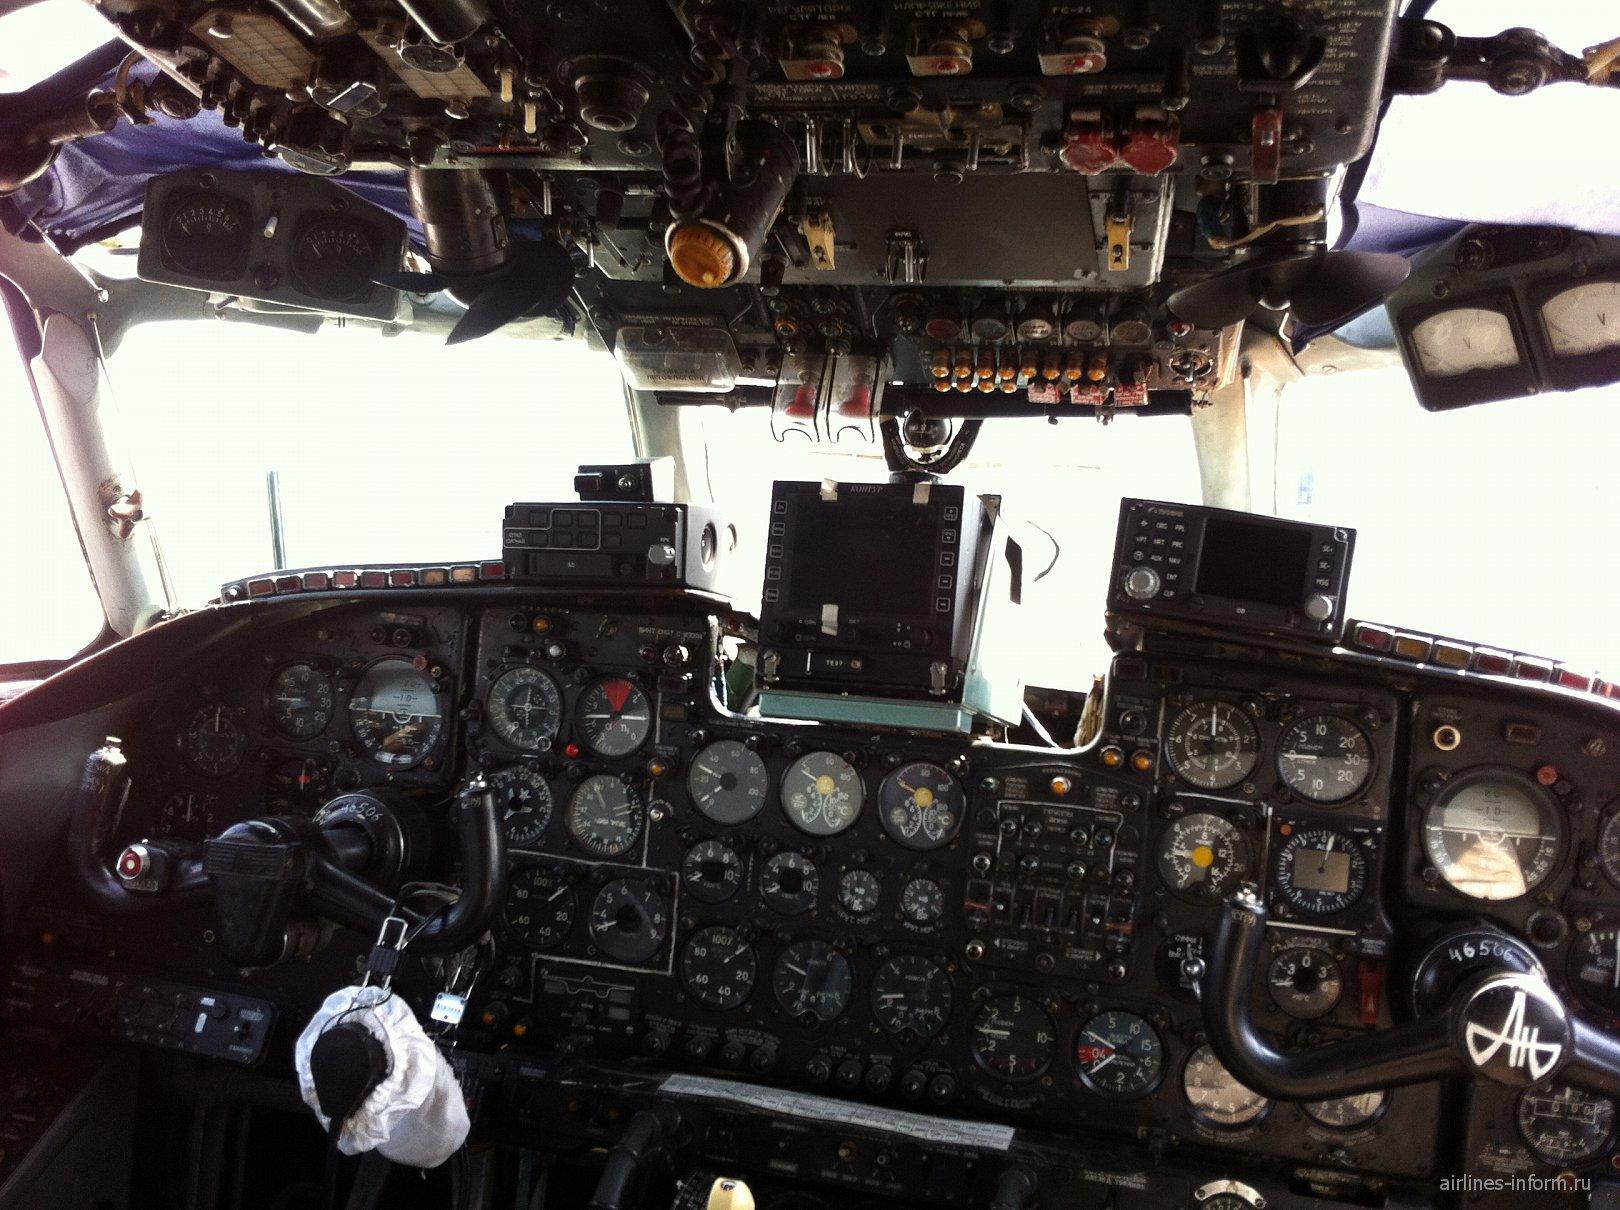 Пилотская кабина самолета Ан-24 Бурятских авиалиний